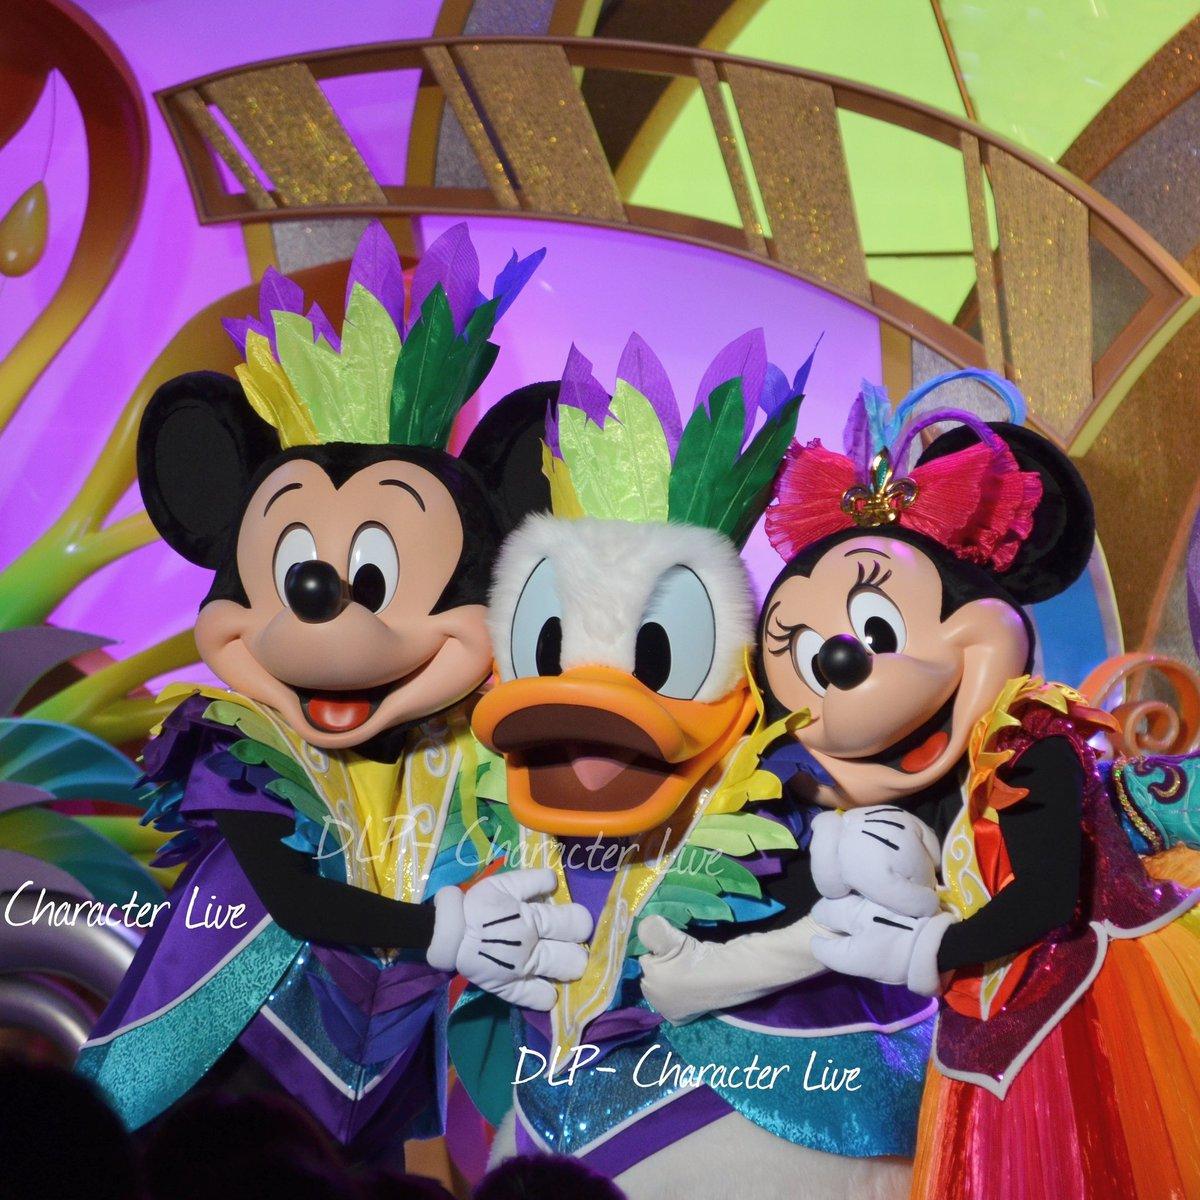 Disney friendship! #donaldduck #mickey #mickeymouse #minnie #minniemouse #ミッキーマウス #ミニーマウス #ドナルドダック #disney #TDR #TDL #TDS #TokyoDisneyResort #TokyoDisneySea #TokyoDisneylandpic.twitter.com/kN71mstyK8